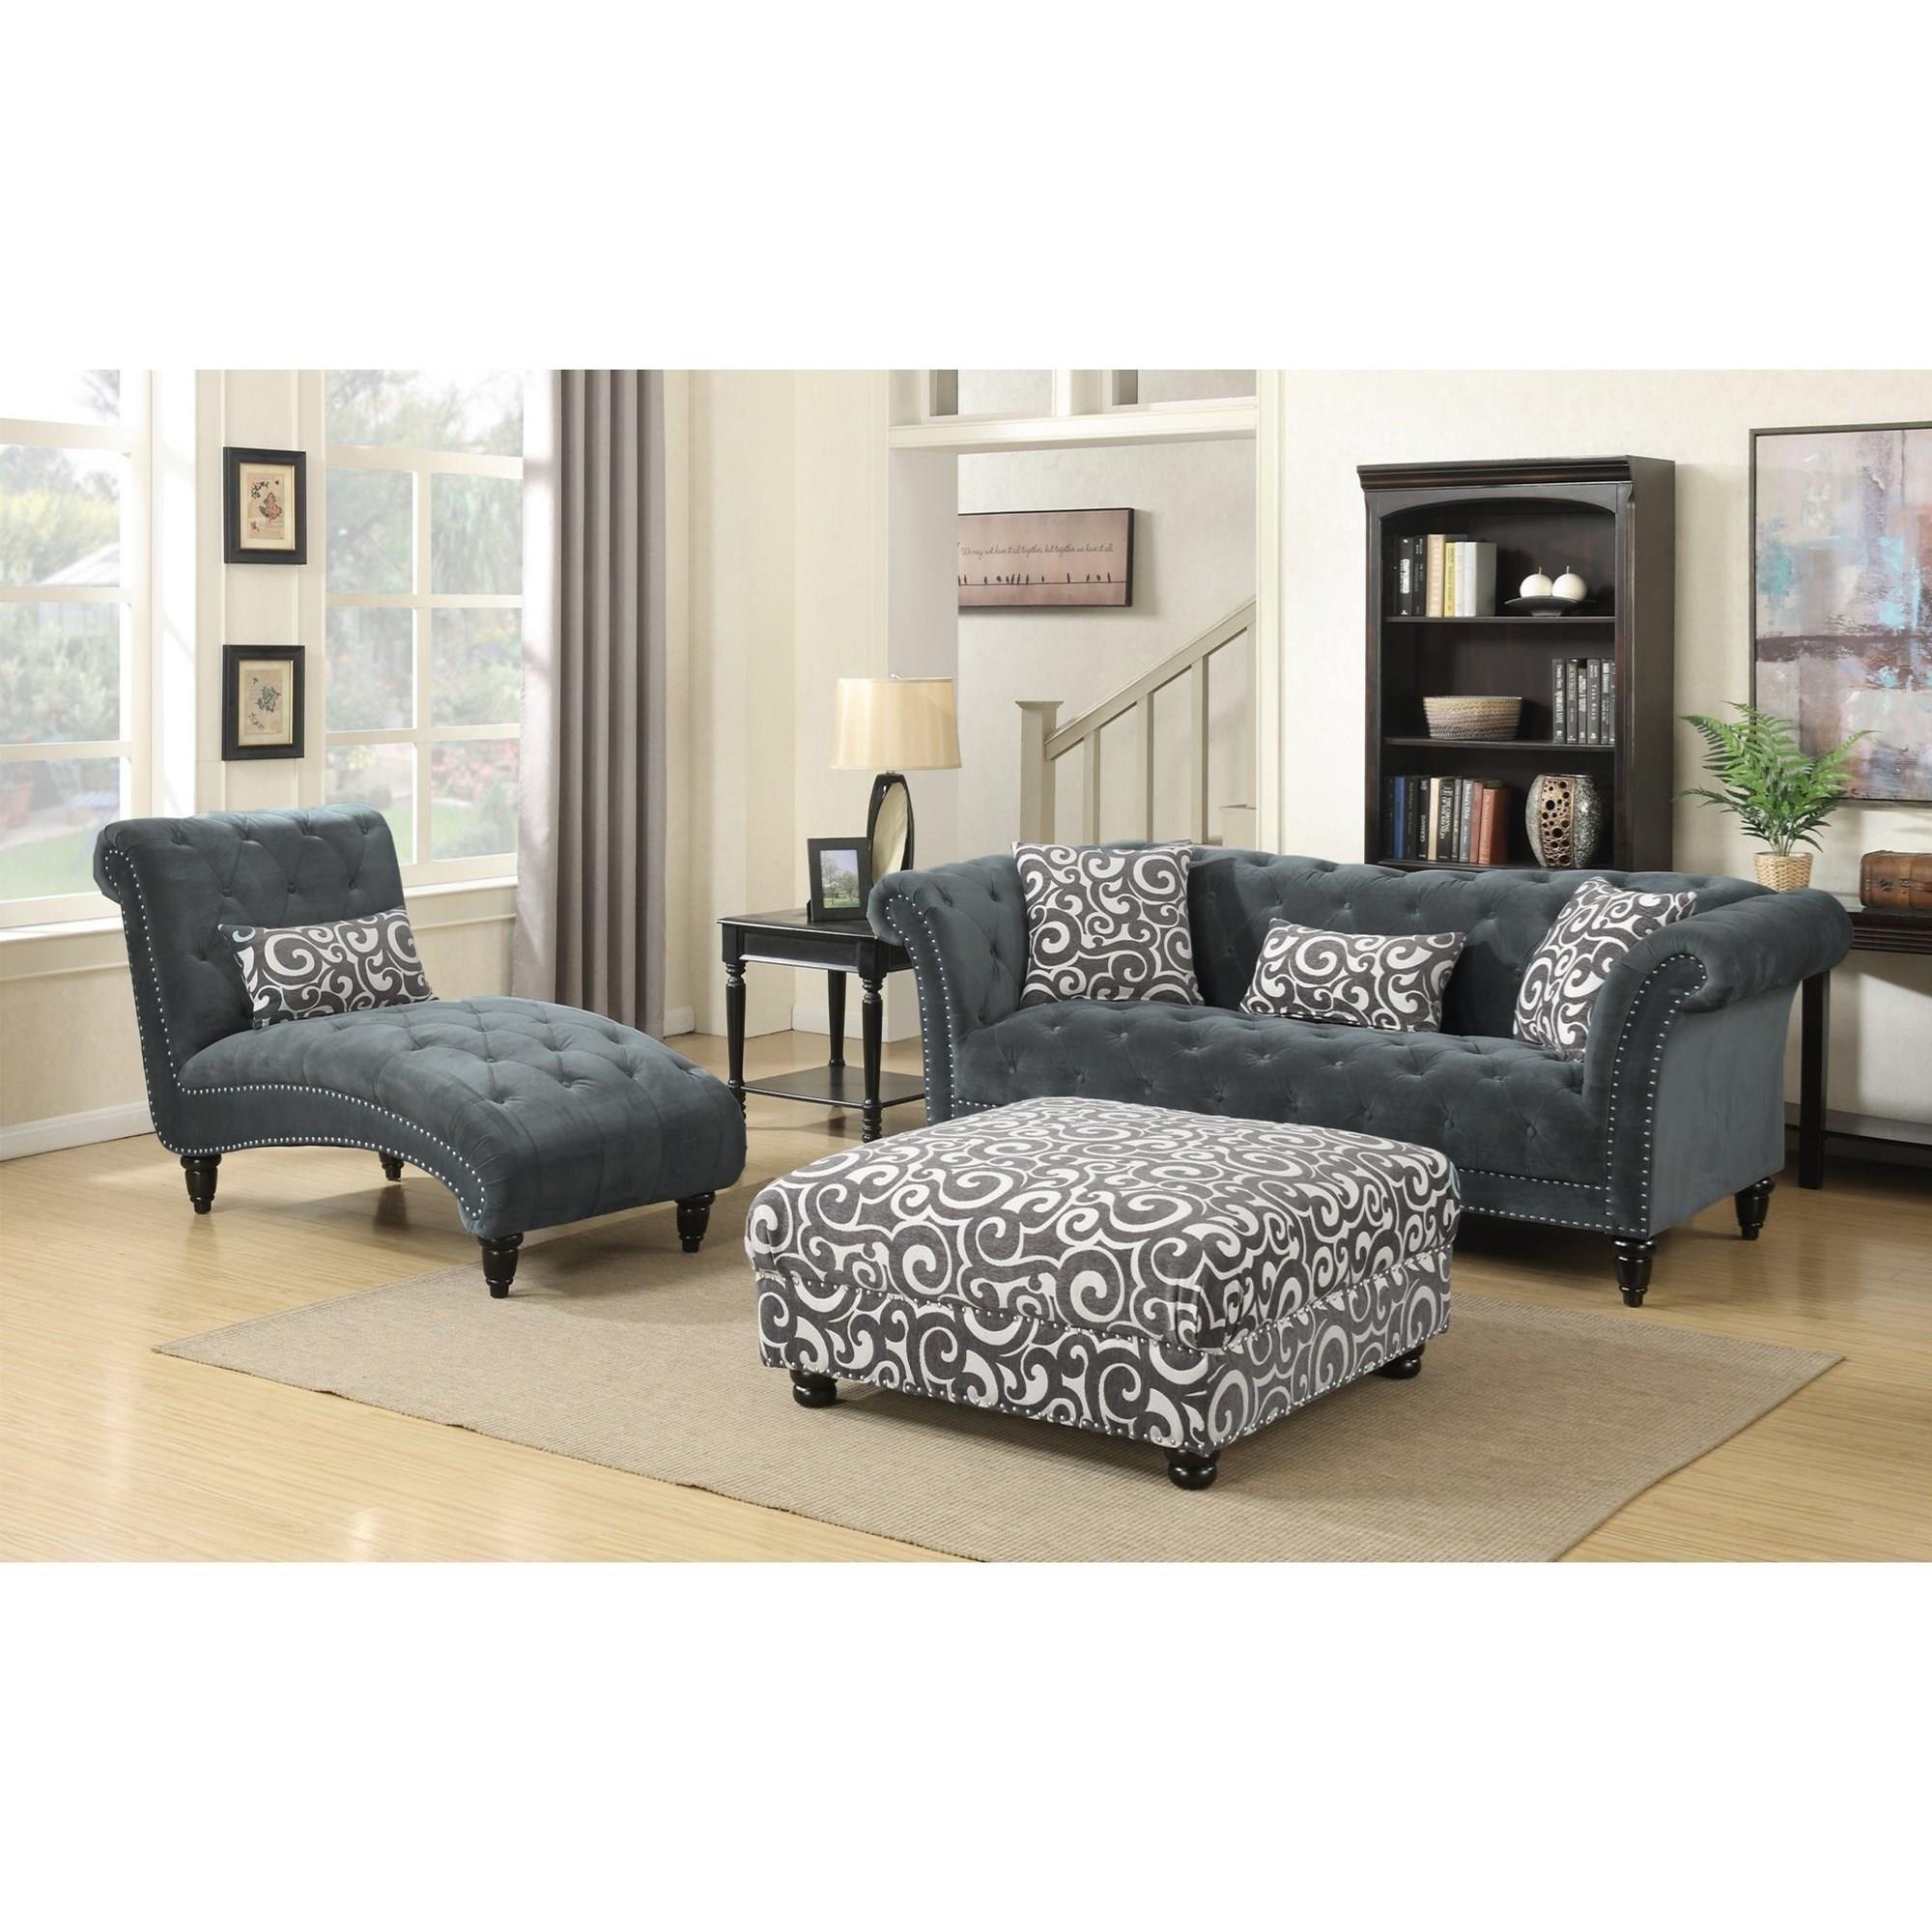 Twain 3-Piece Living Room Group by Elements International at Lynn's Furniture & Mattress